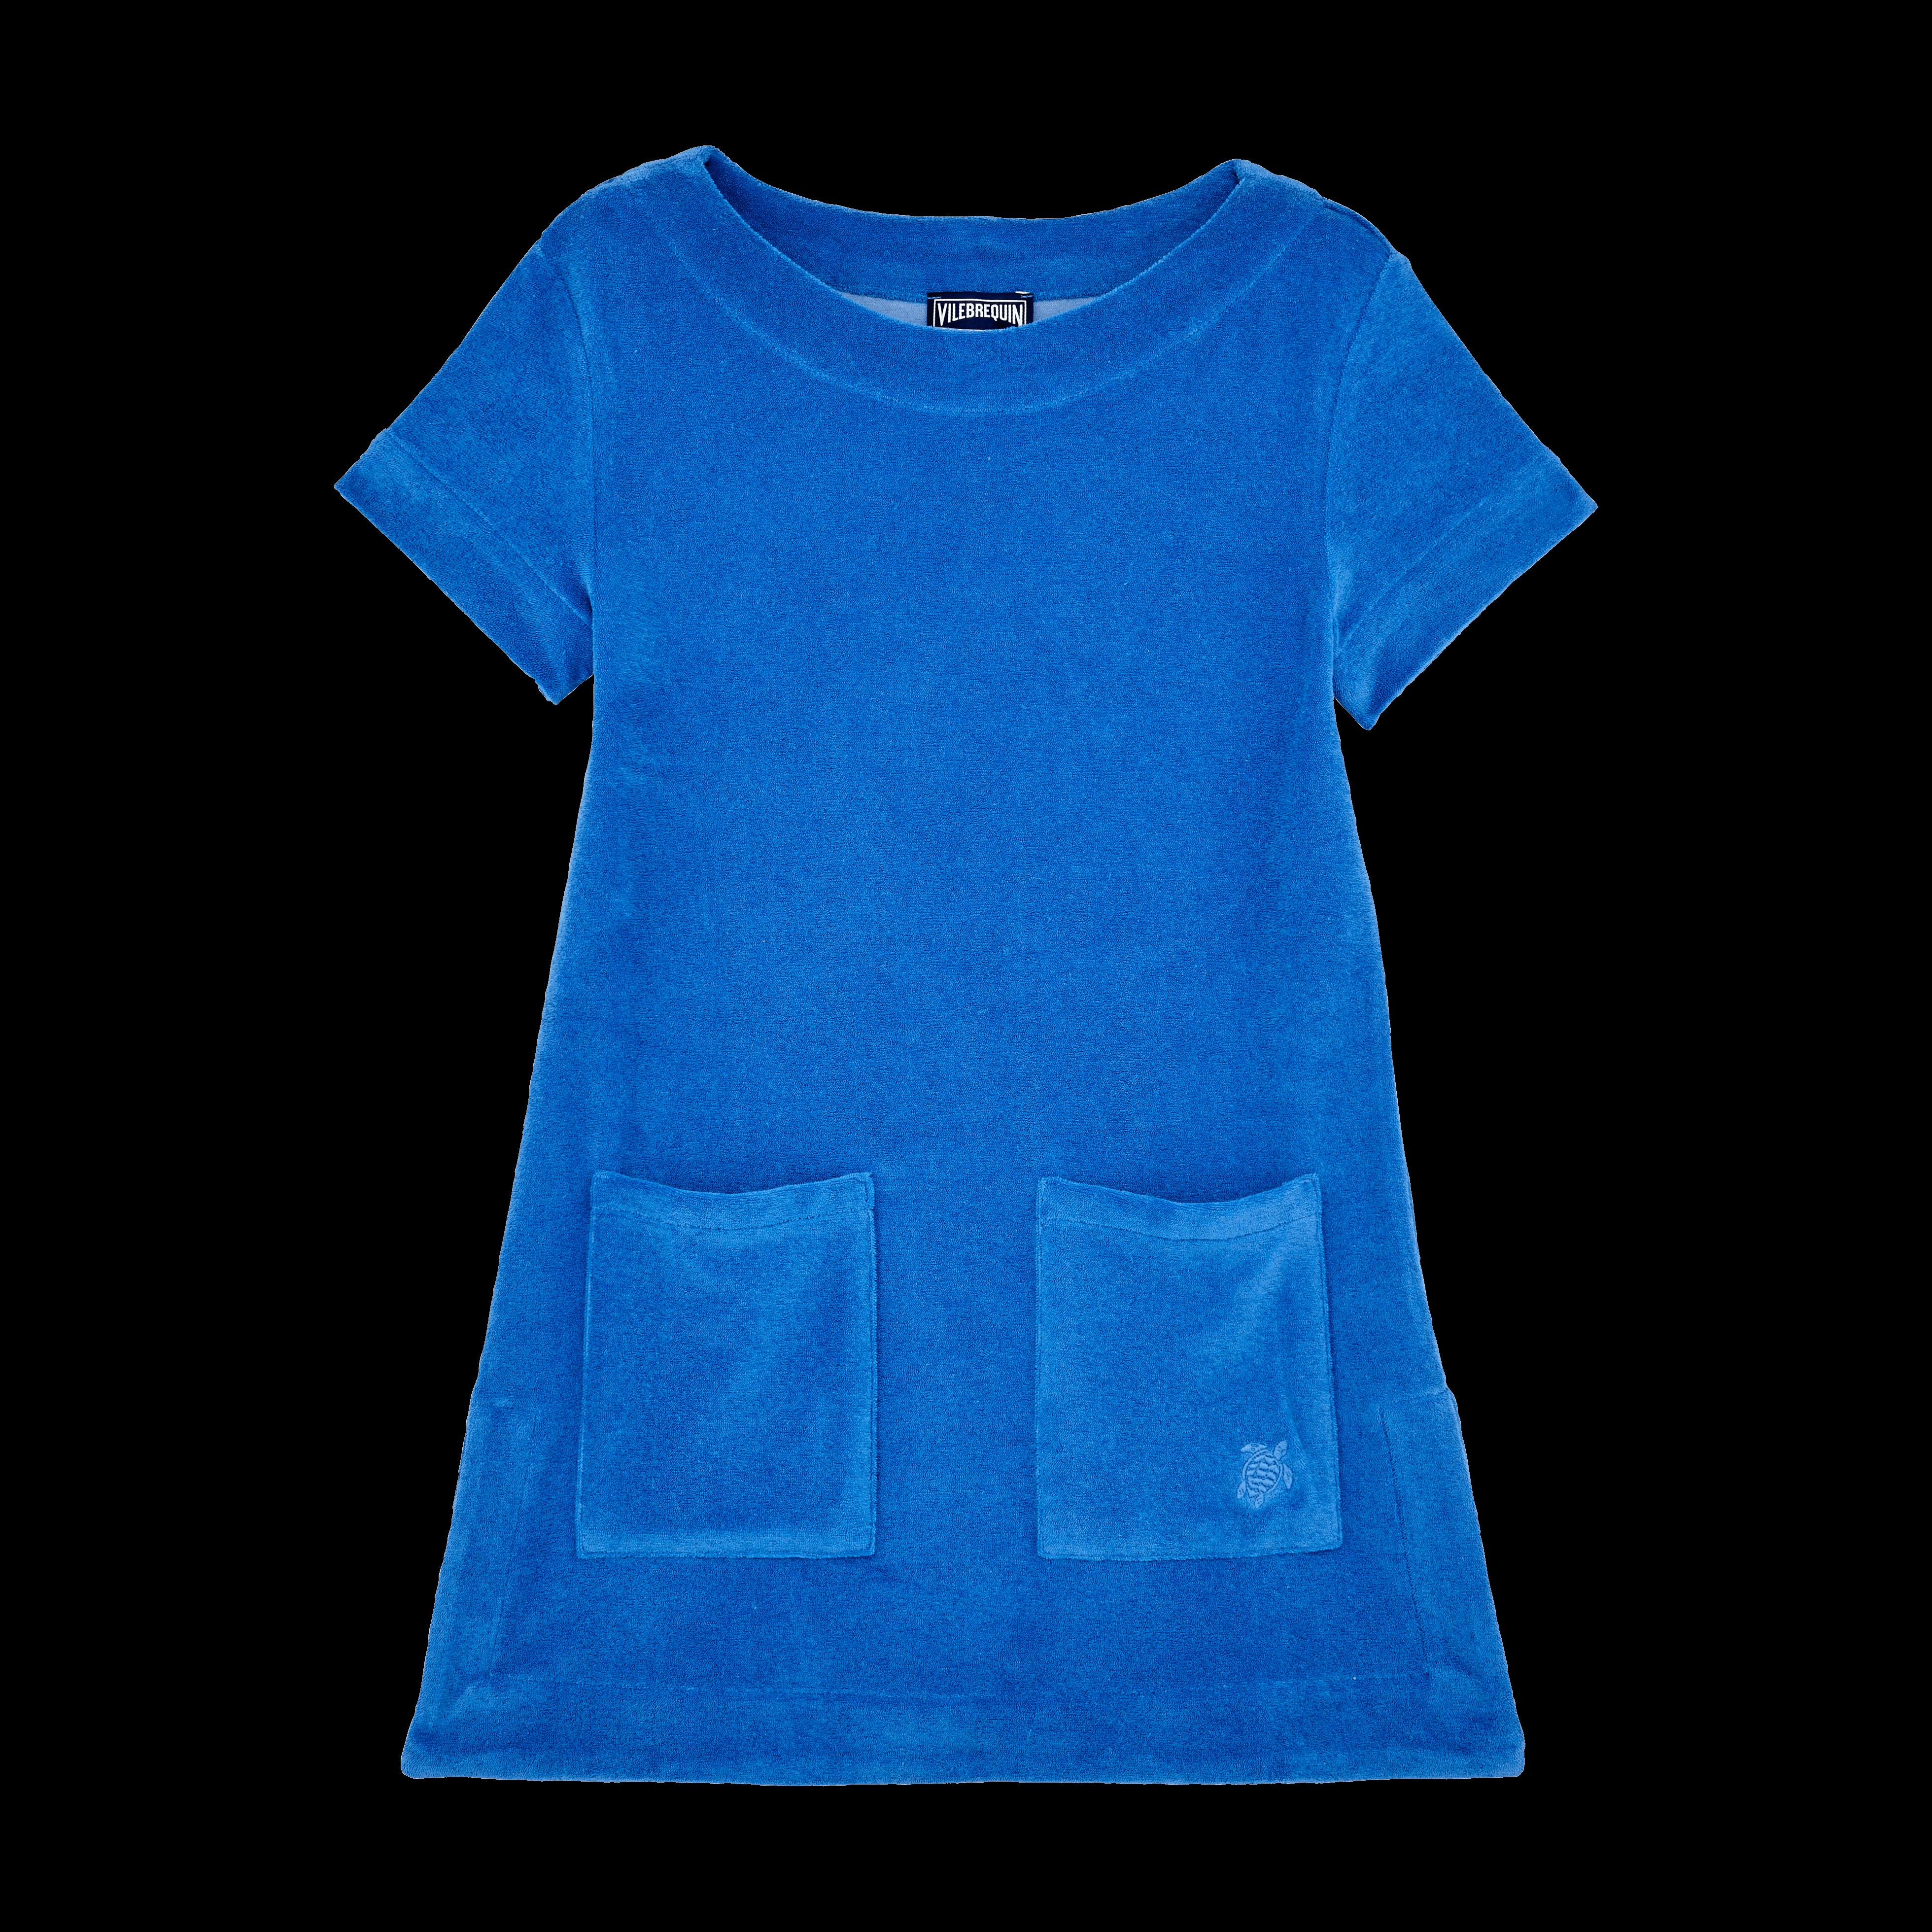 VILEBREQUIN | Girls Ready to Wear - Girls Terry Cloth Dress Solid - DRESS - GELATA - Blue - 14 - Vilebrequin | Goxip